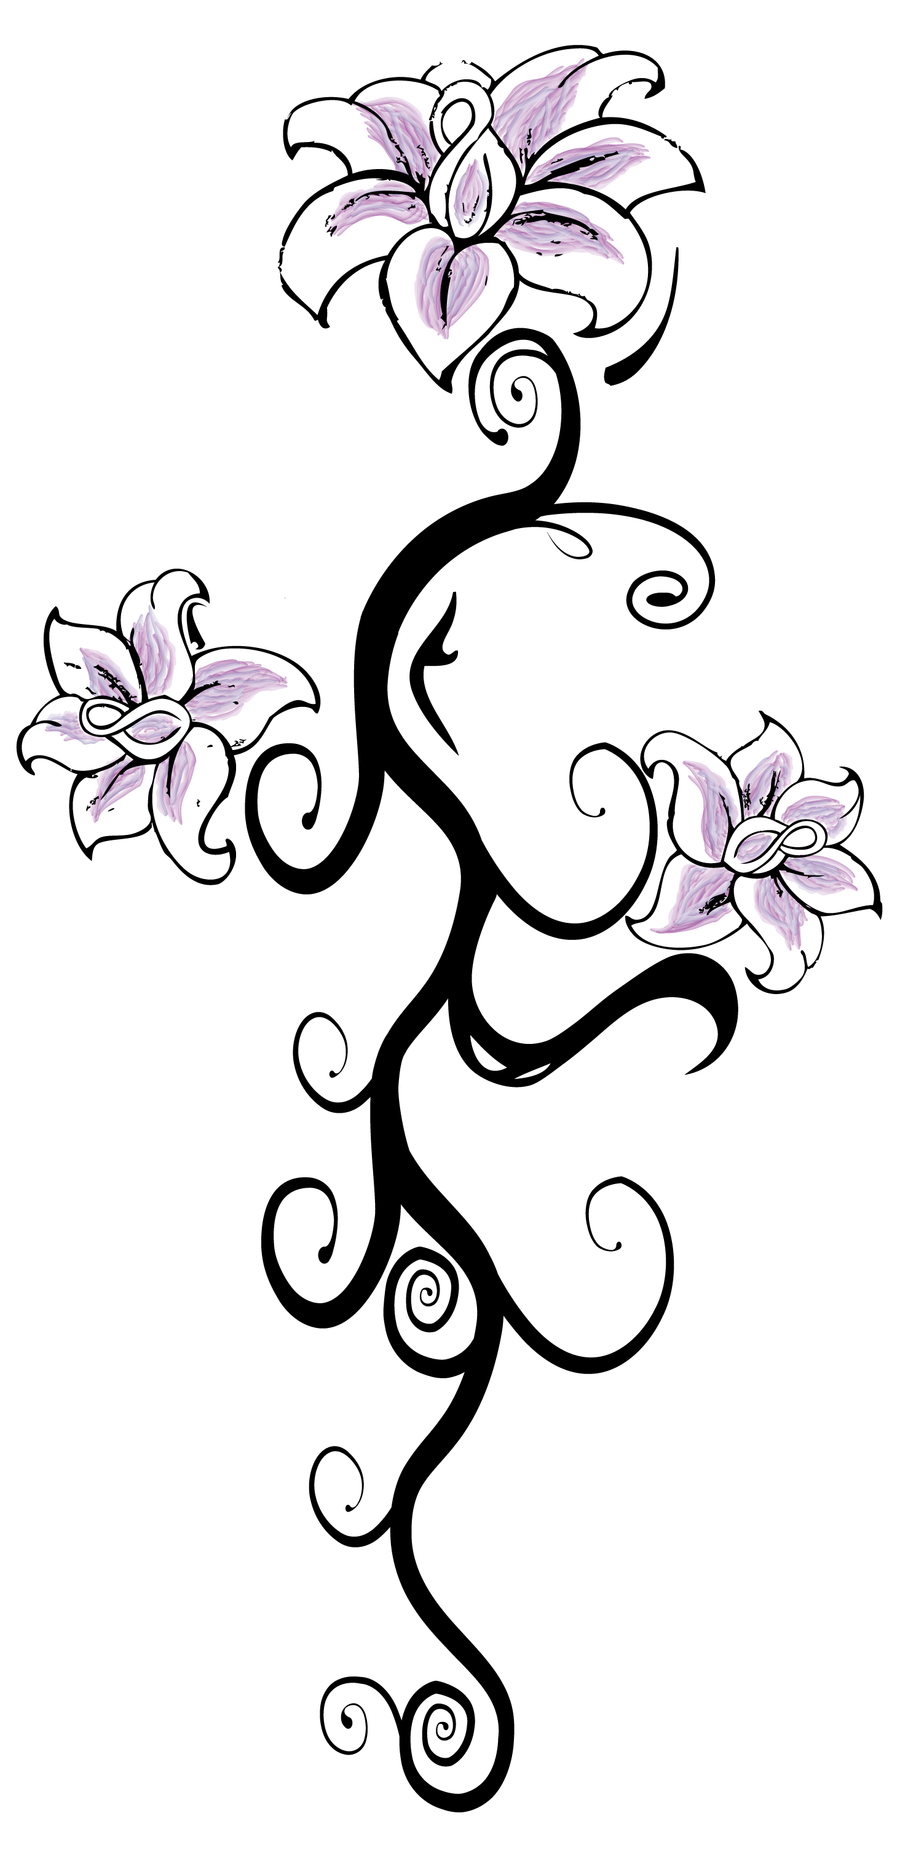 Flower back tattoo by ladysilver2267 on deviantart for Back tattoo flower designs